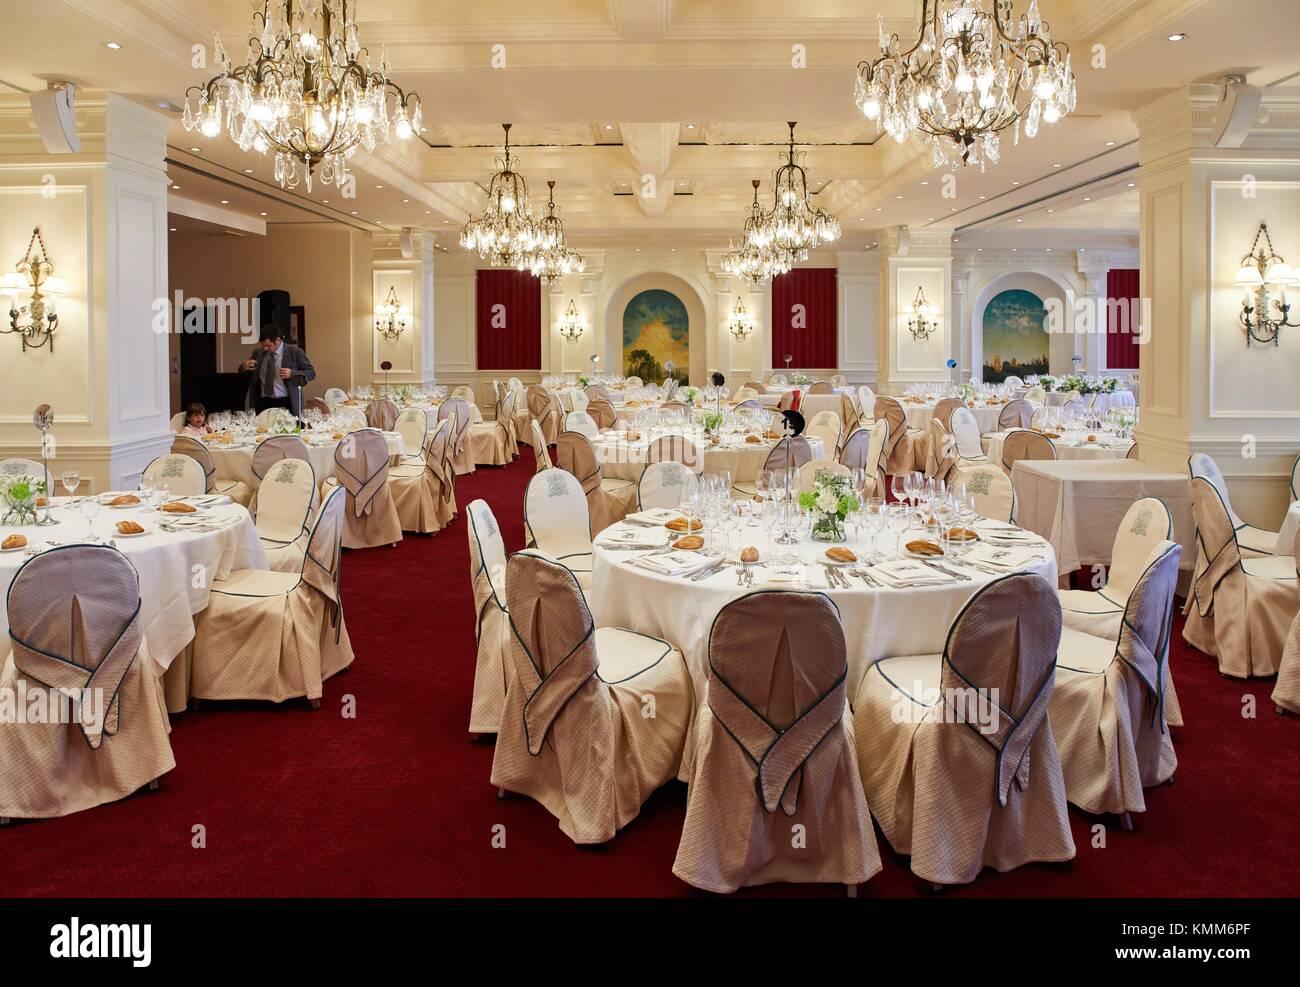 Dining room for banquet, Hotel Londres, Donostia, San Sebastian, Gipuzkoa, Basque Country, Spain, Europe - Stock Image